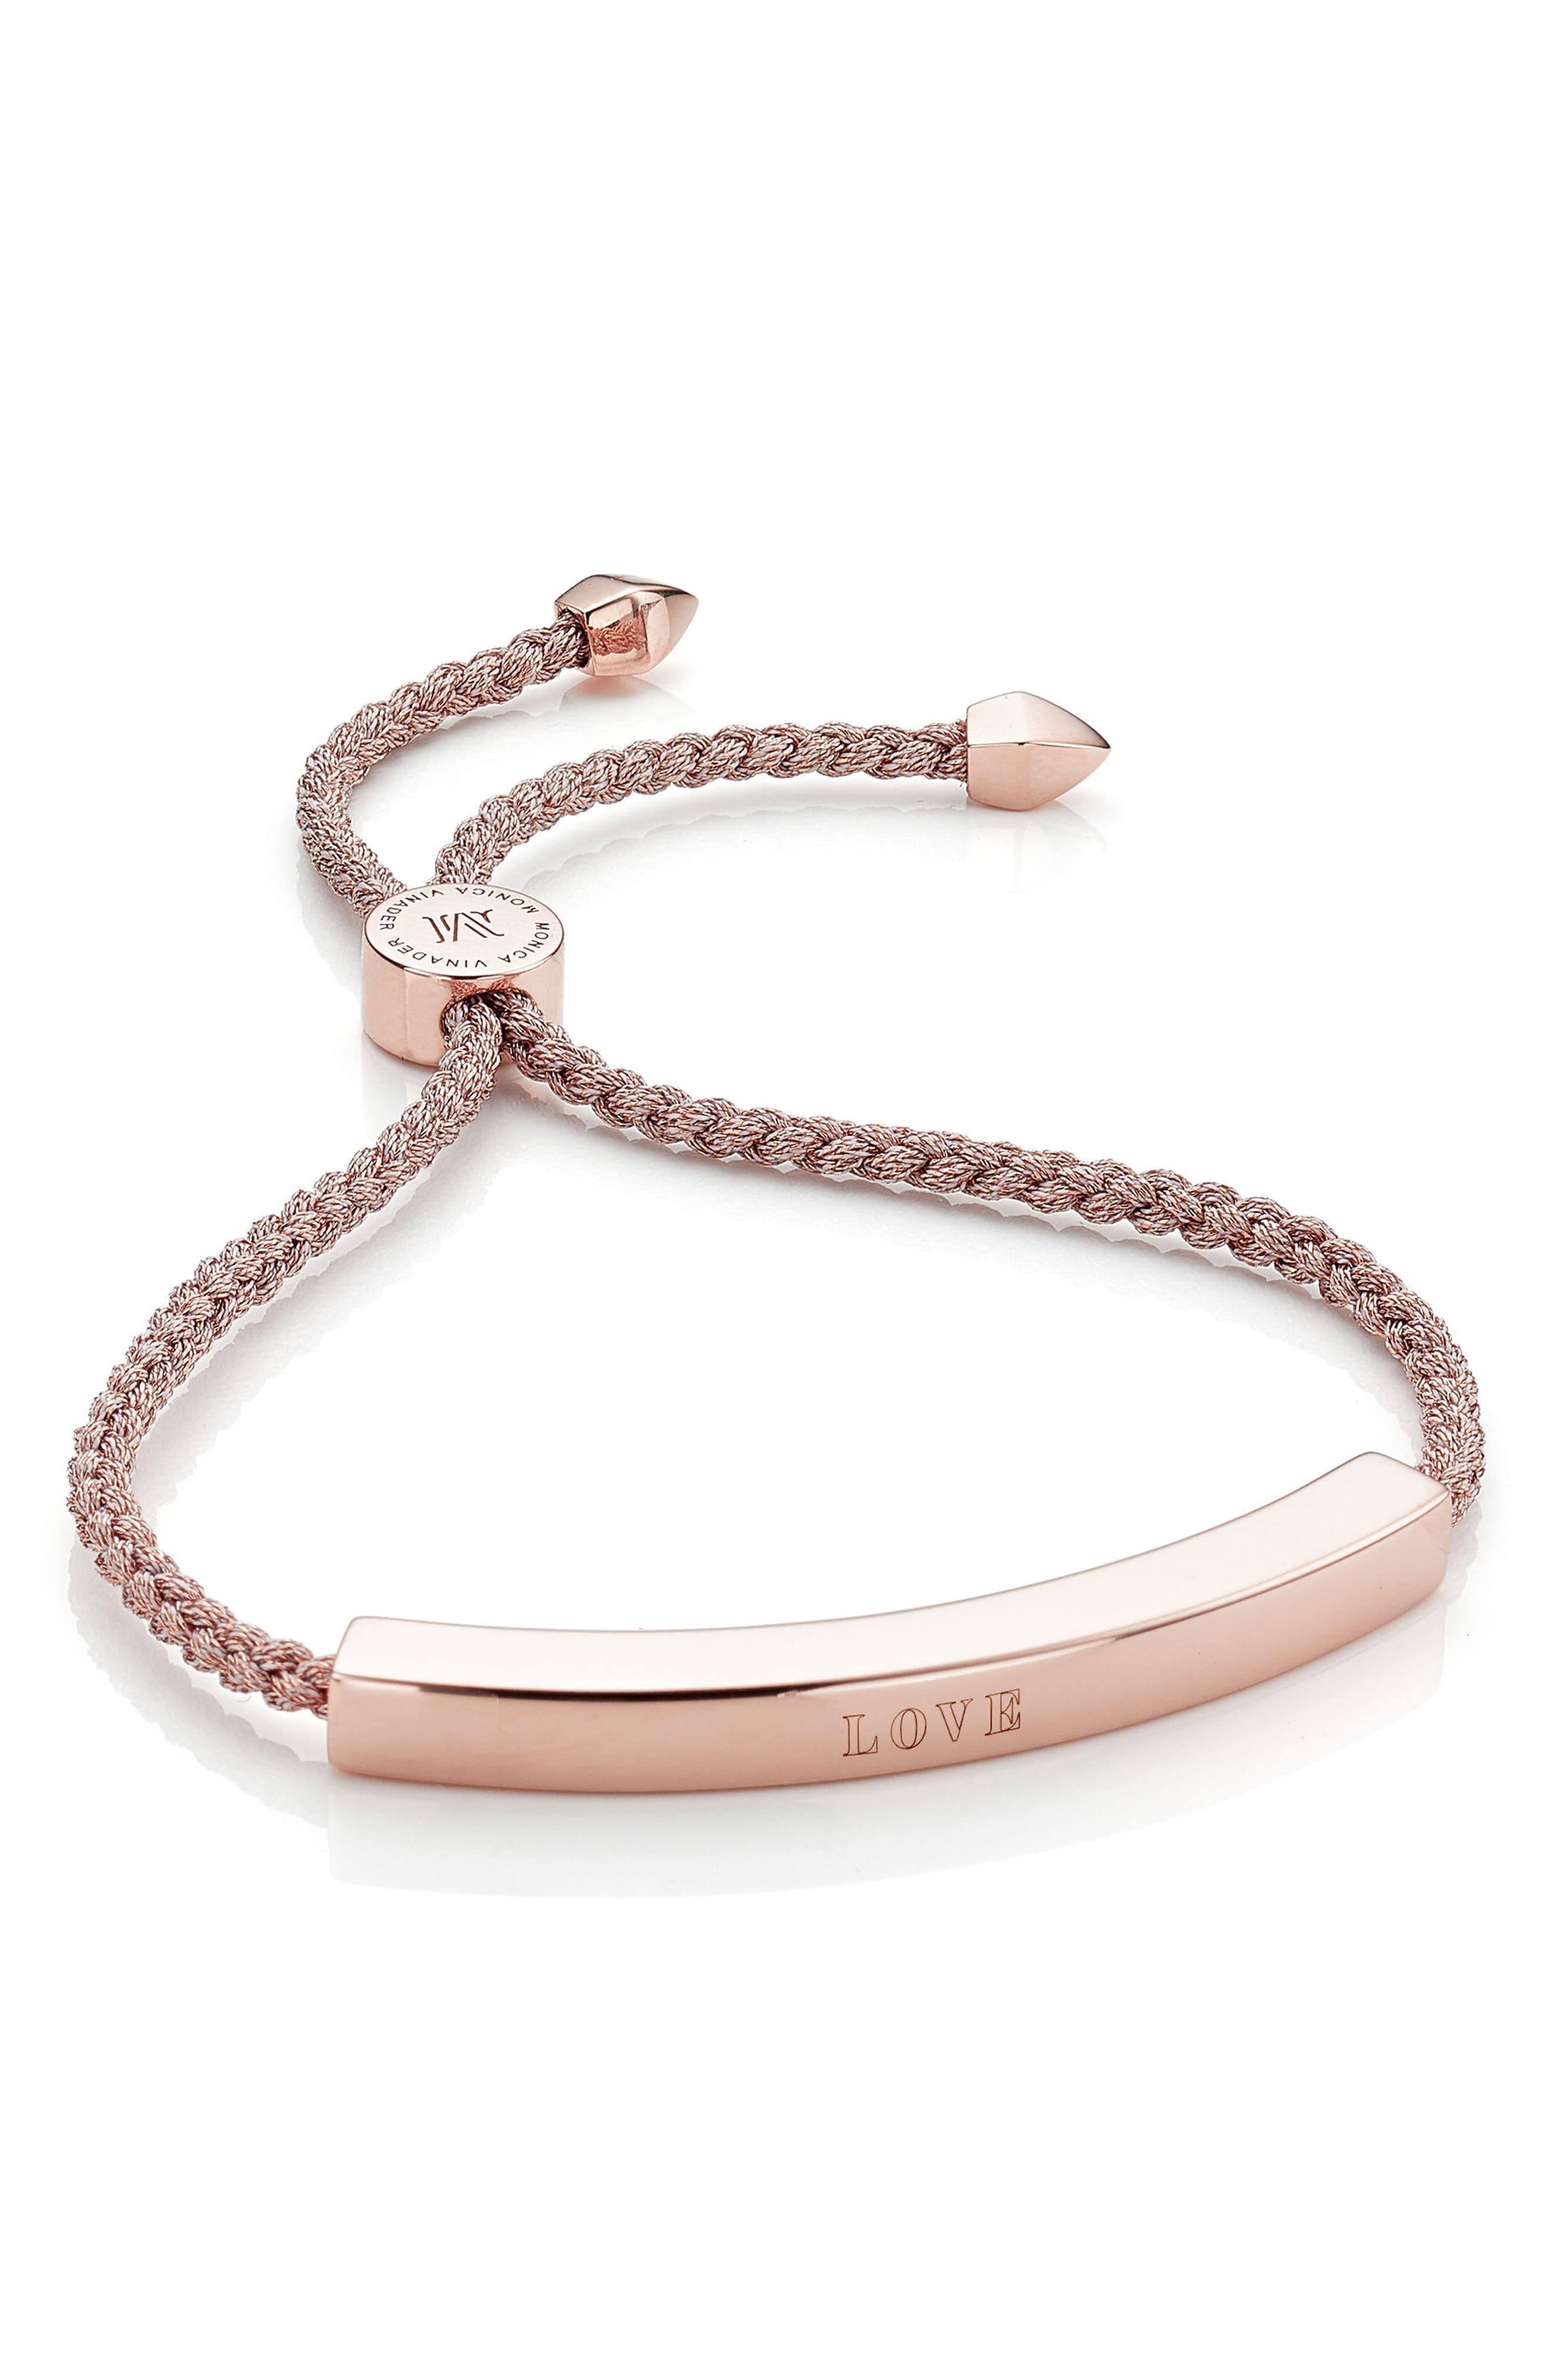 Engravable Large Linear Friendship Bracelet,                             Alternate thumbnail 3, color,                             METALLIC/ ROSE GOLD